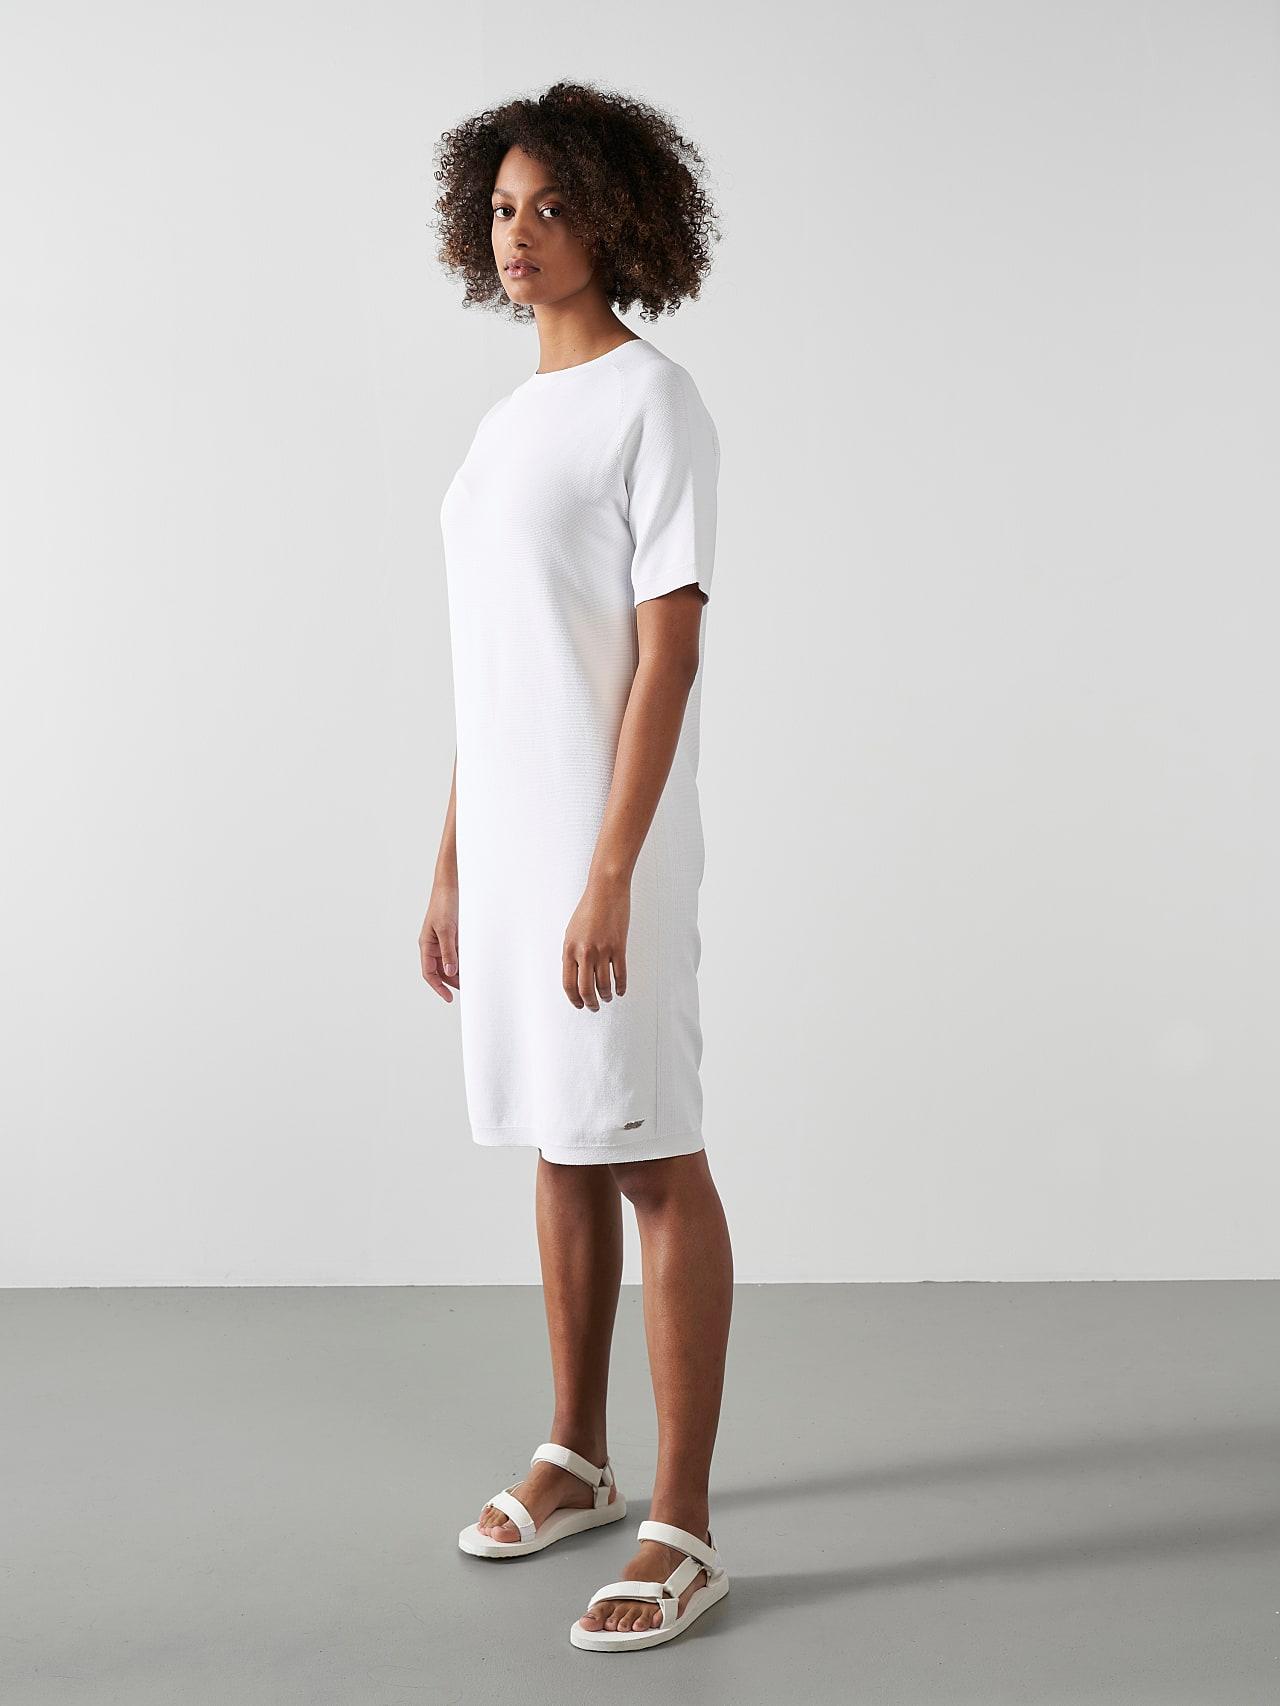 FZORF V1.Y5.01 Seamless Knit Dress white Model shot Alpha Tauri